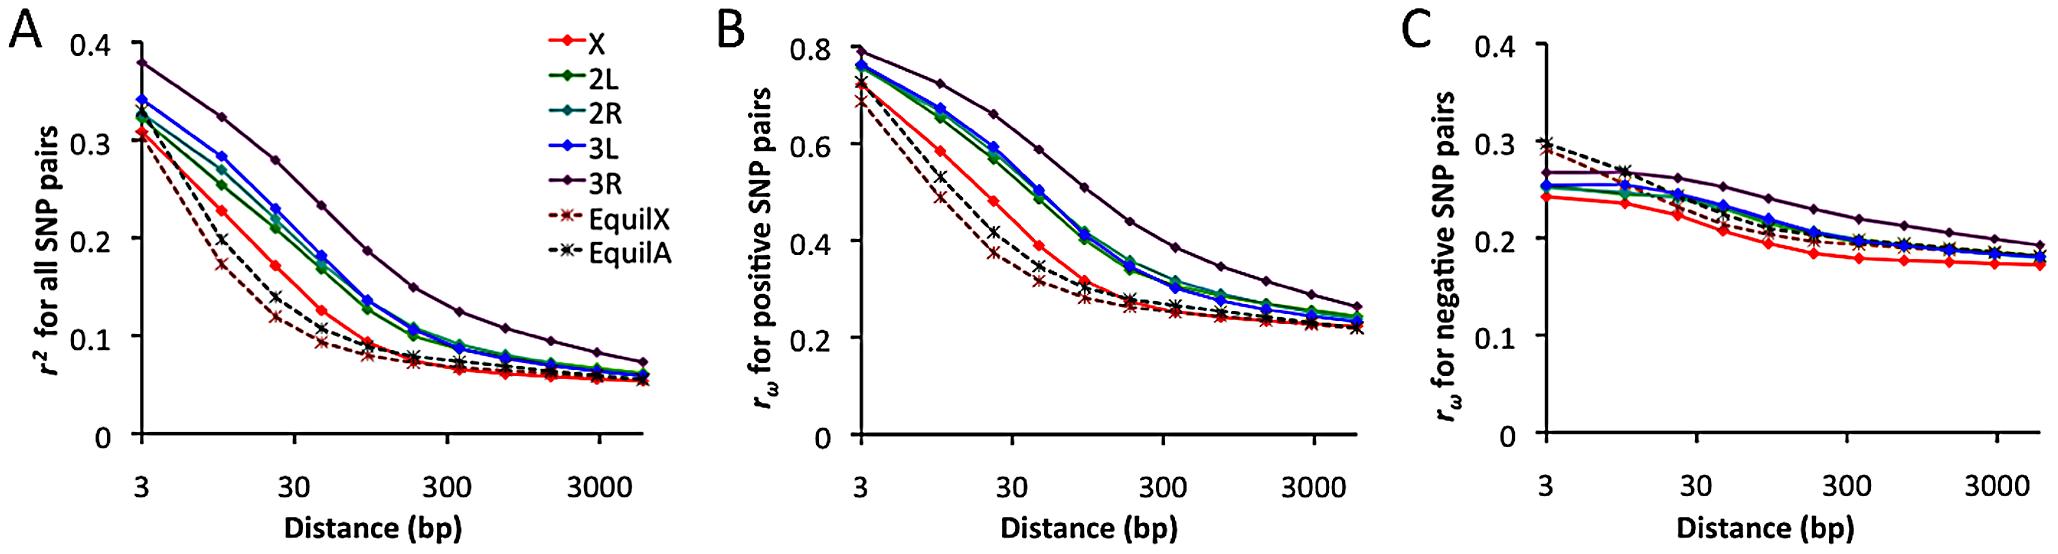 Linkage disequilibrium (LD), excluding singleton polymorphisms.